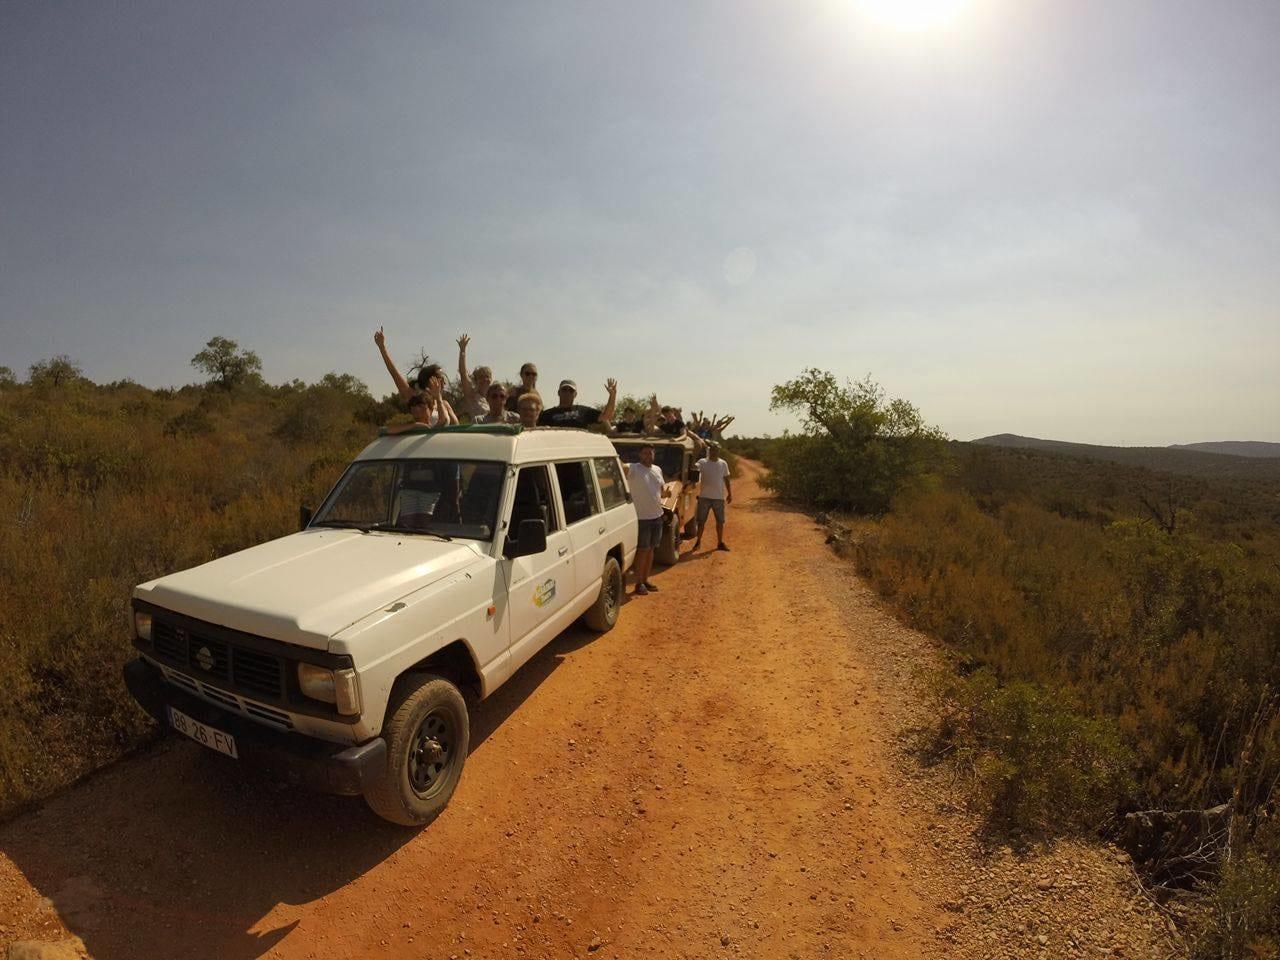 Jeep Safari In Algarve, Portugal